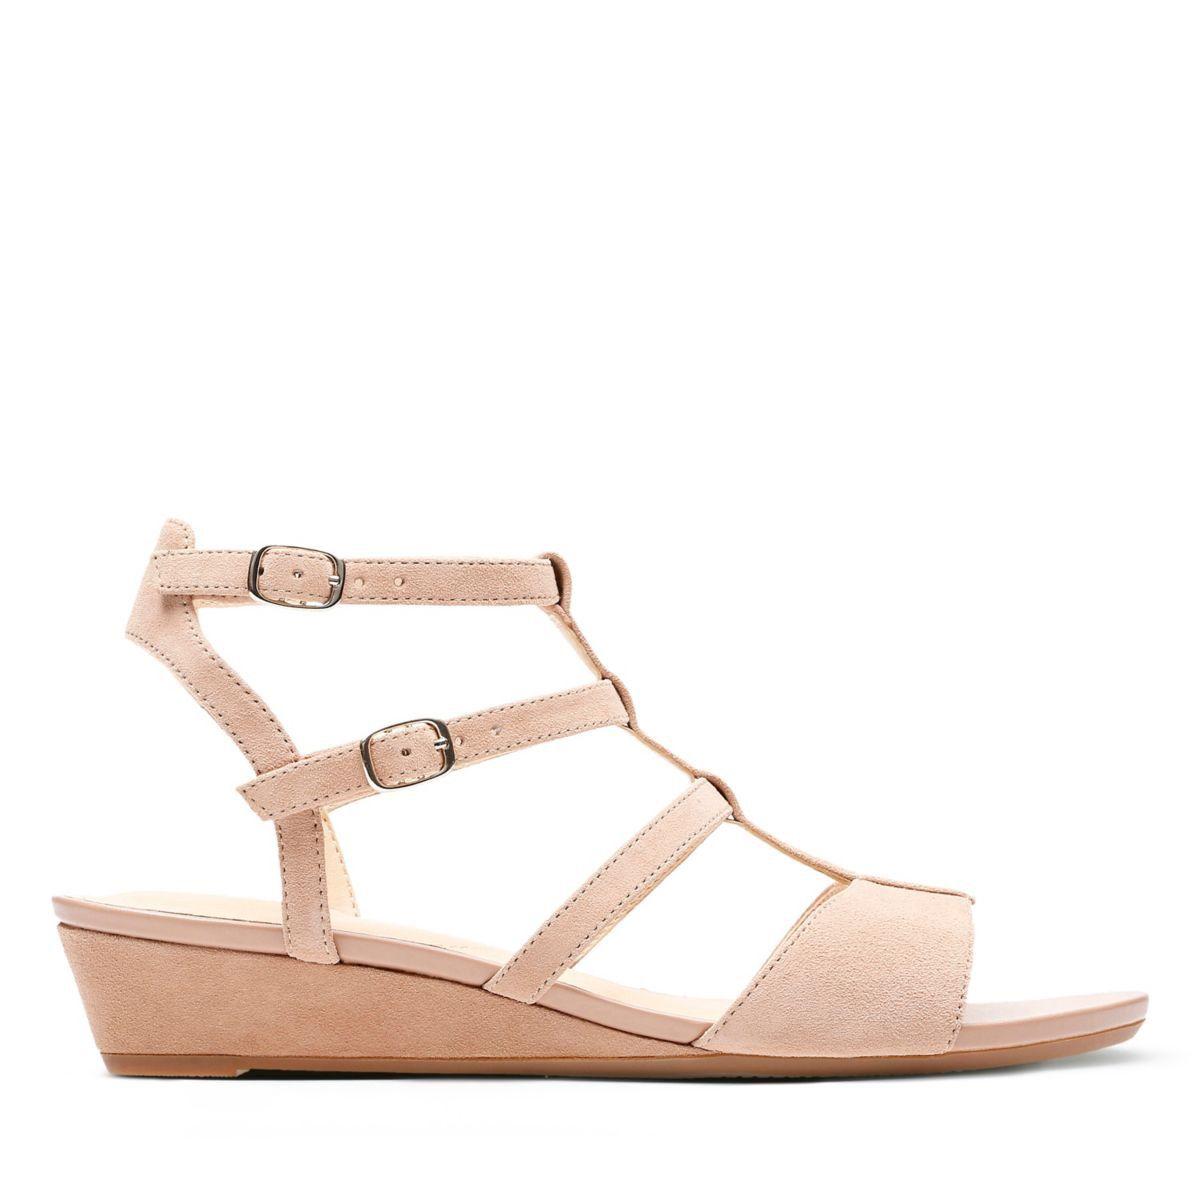 946ee1a03 Clarks Parram Spice - Womens Sandals Beige Suede 8.5